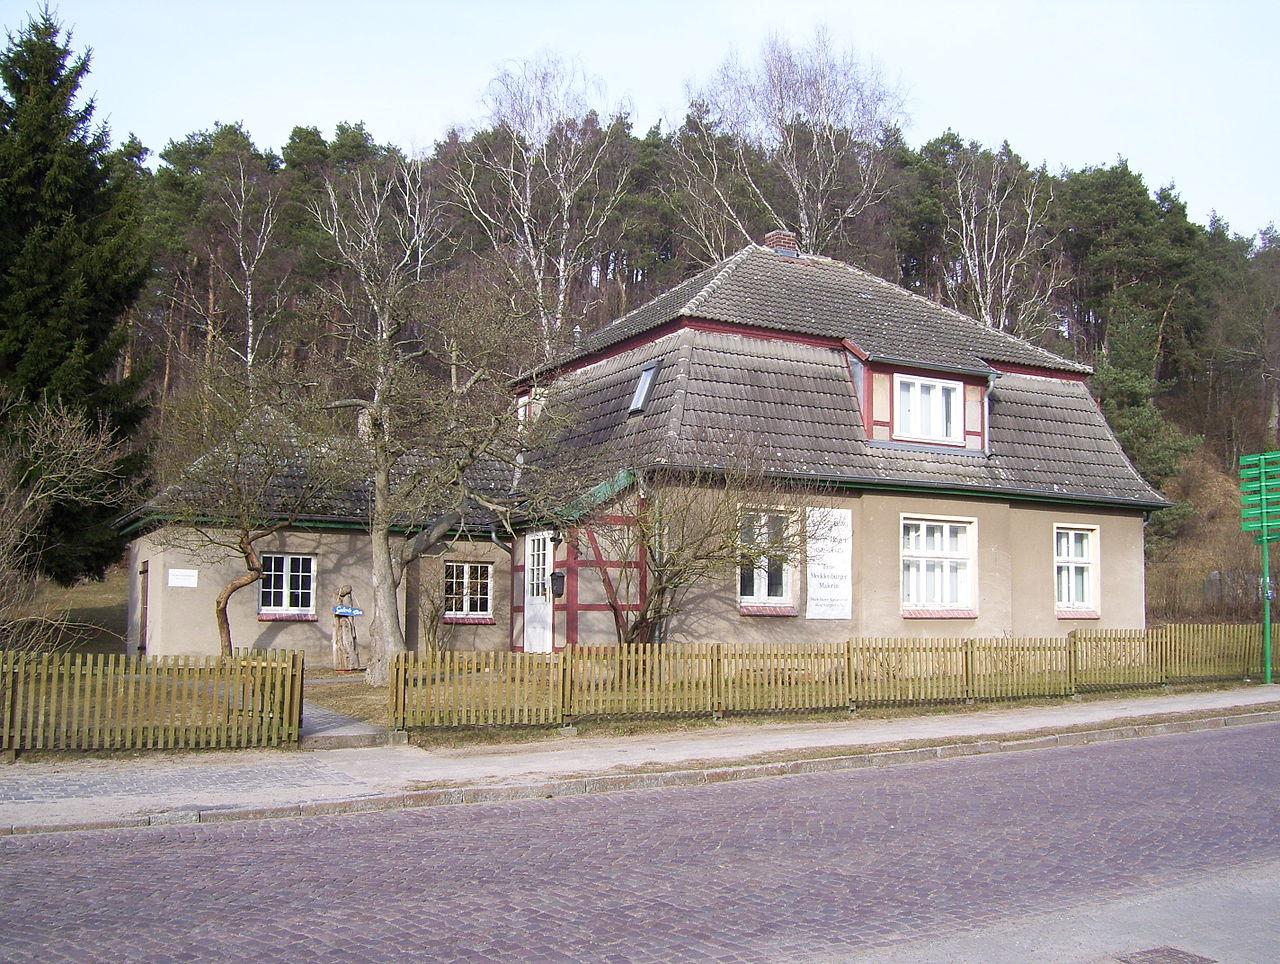 Bild Marie Hager Haus Burg Stargard